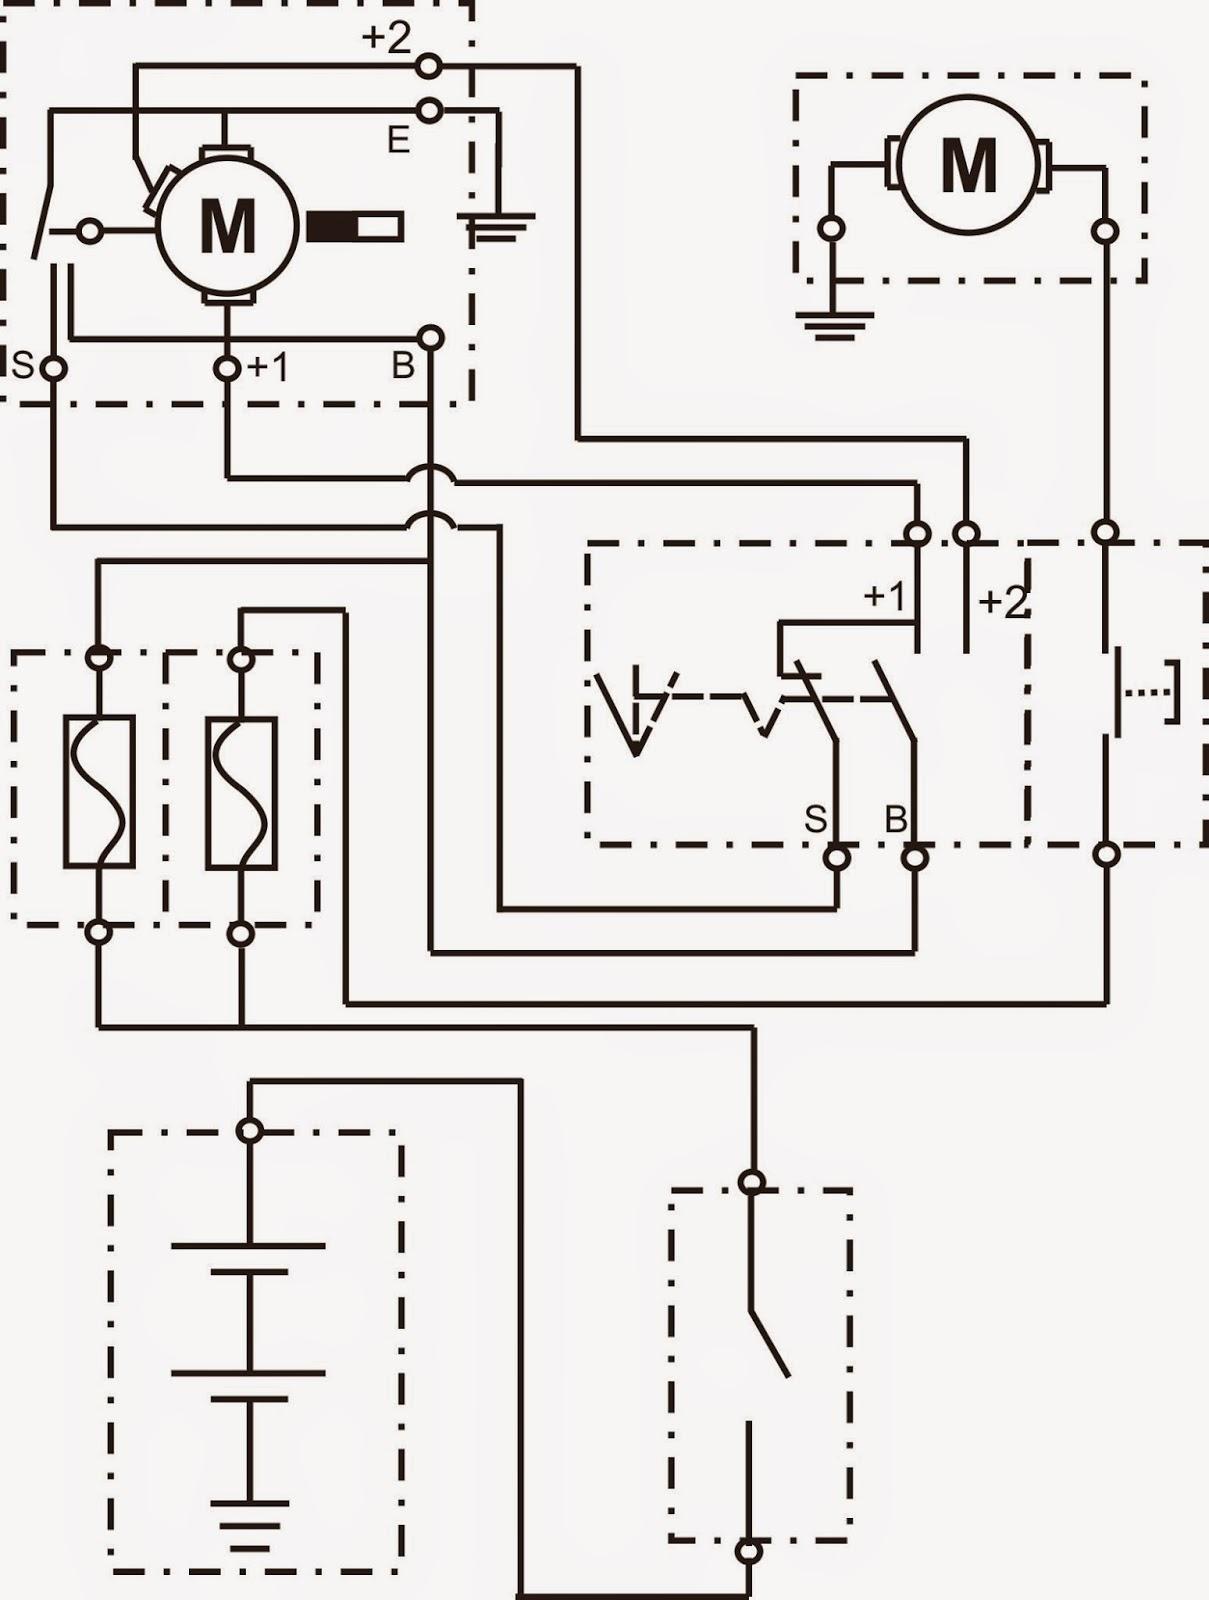 Materi Sistem Kelistrikan Otomotif Otomotif Zone